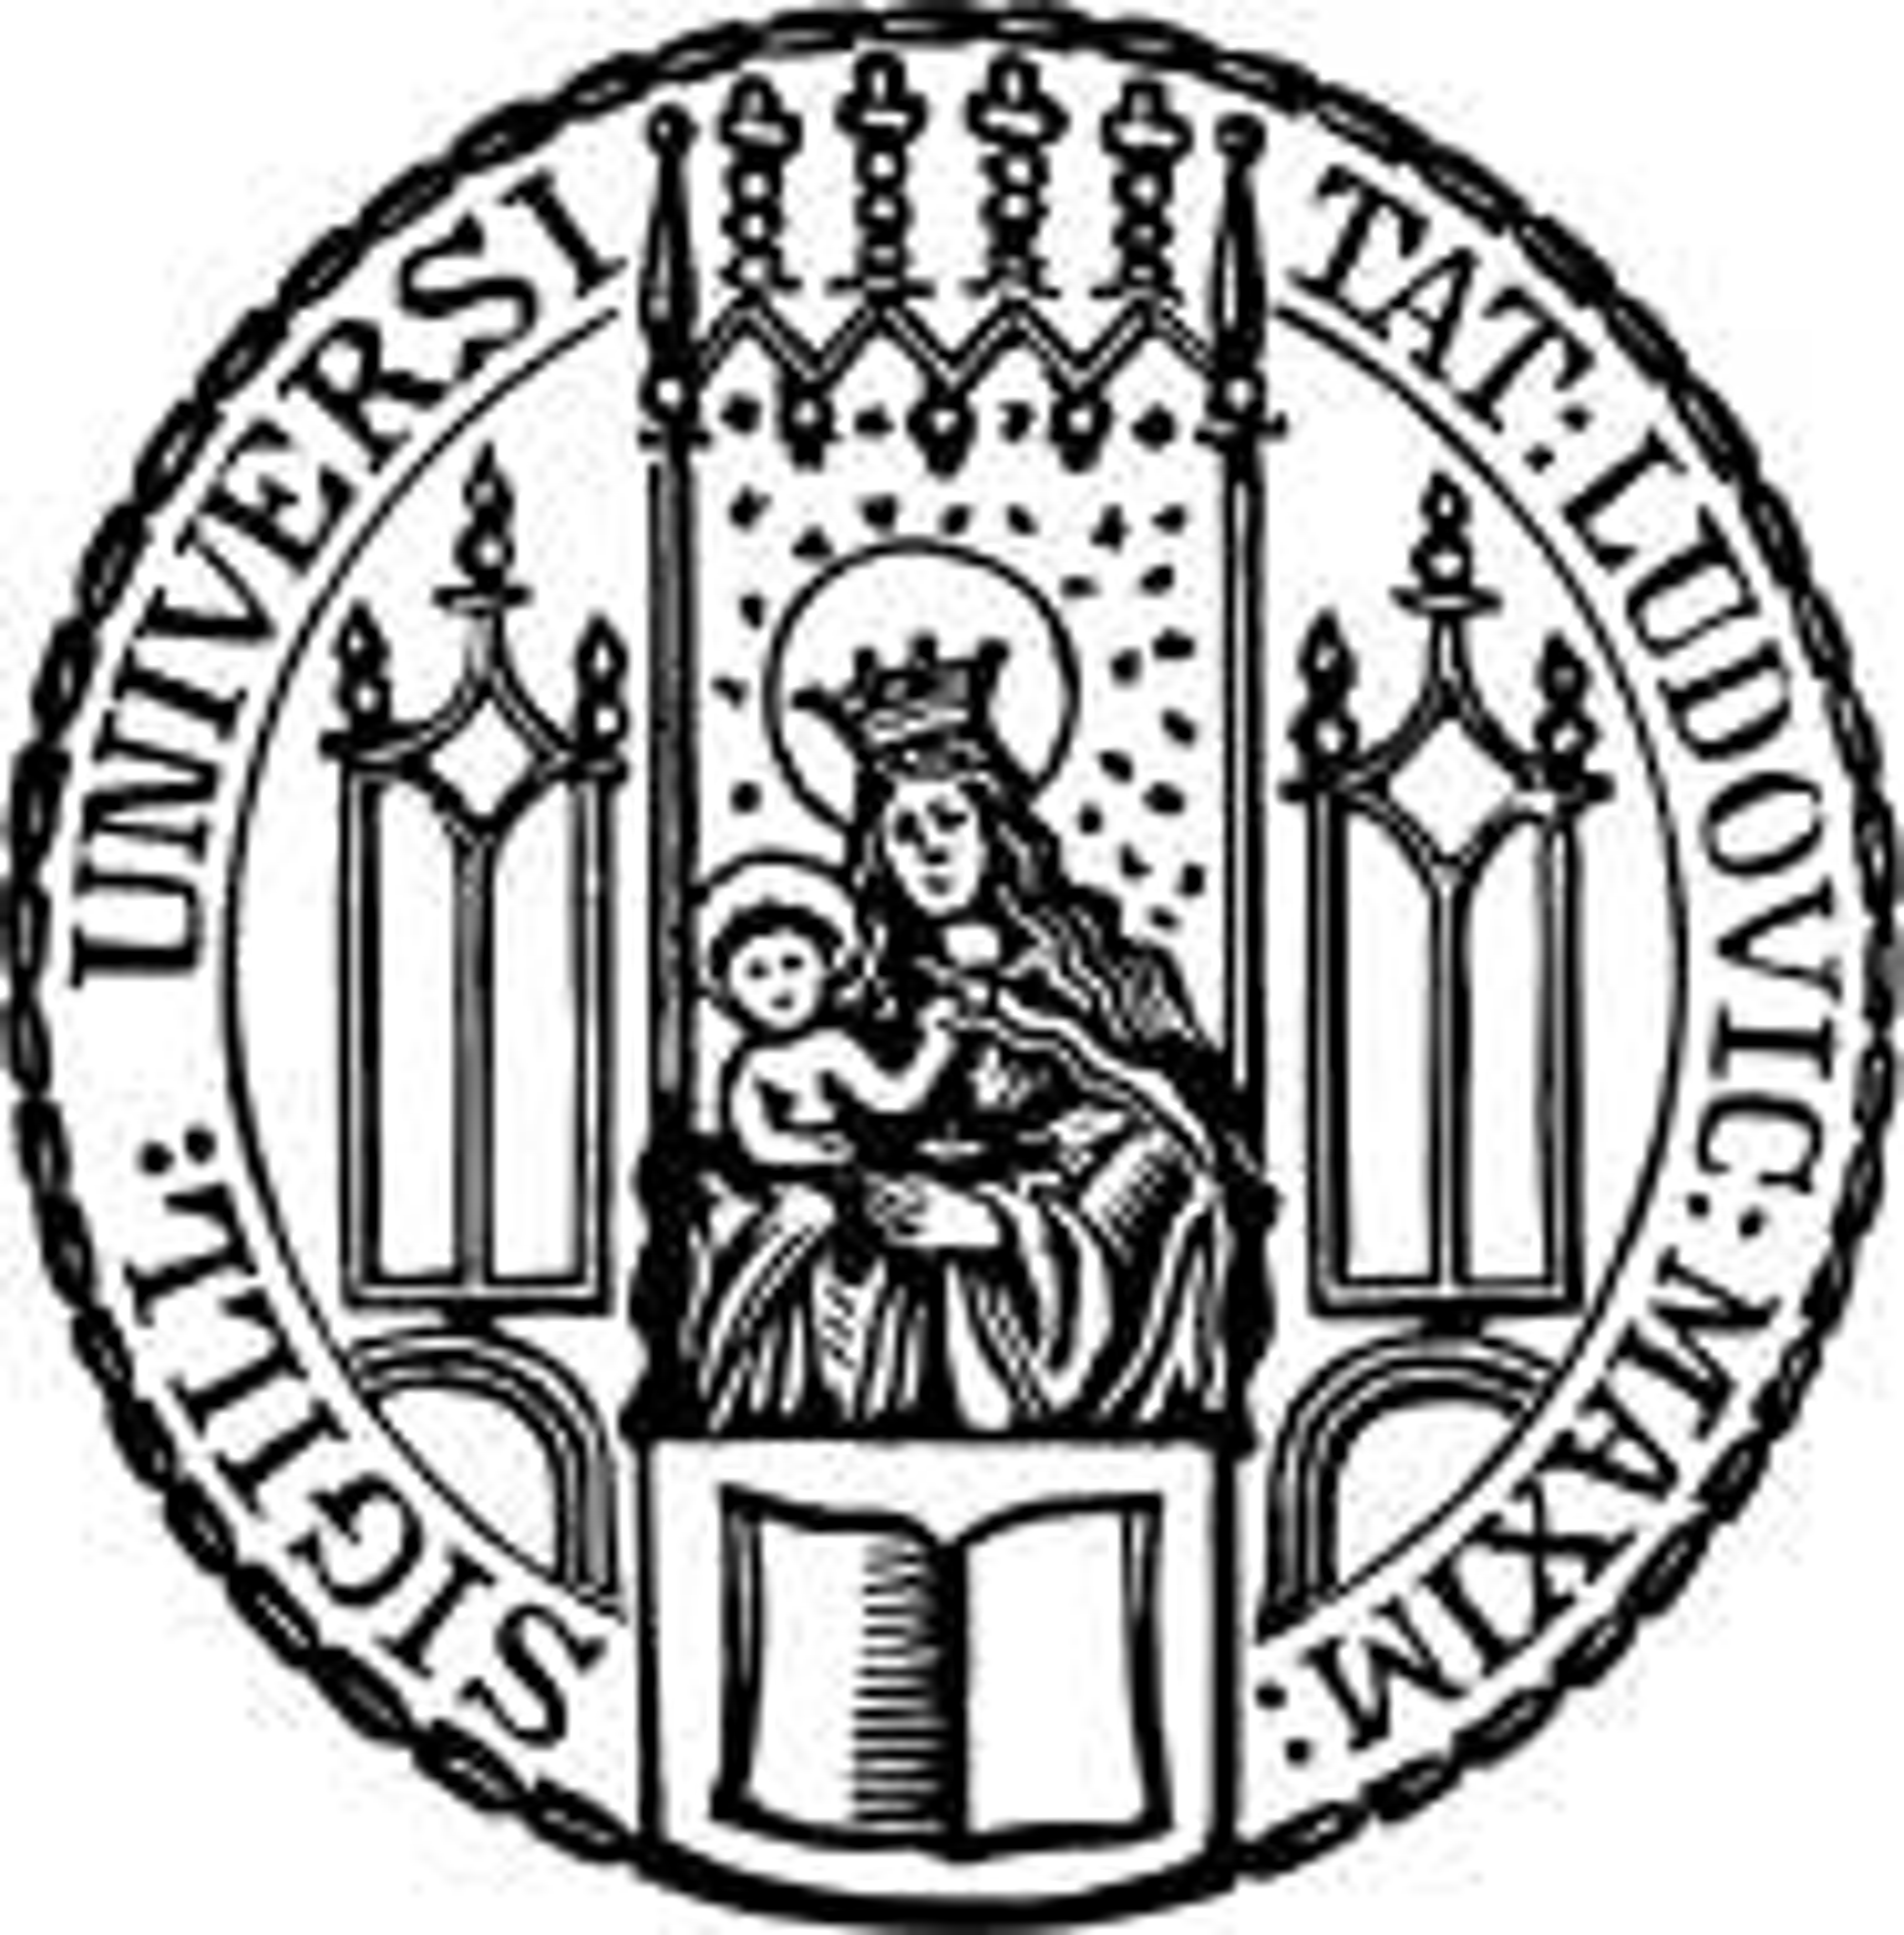 Logo 1392831808.png?ixlib=rb 1.1